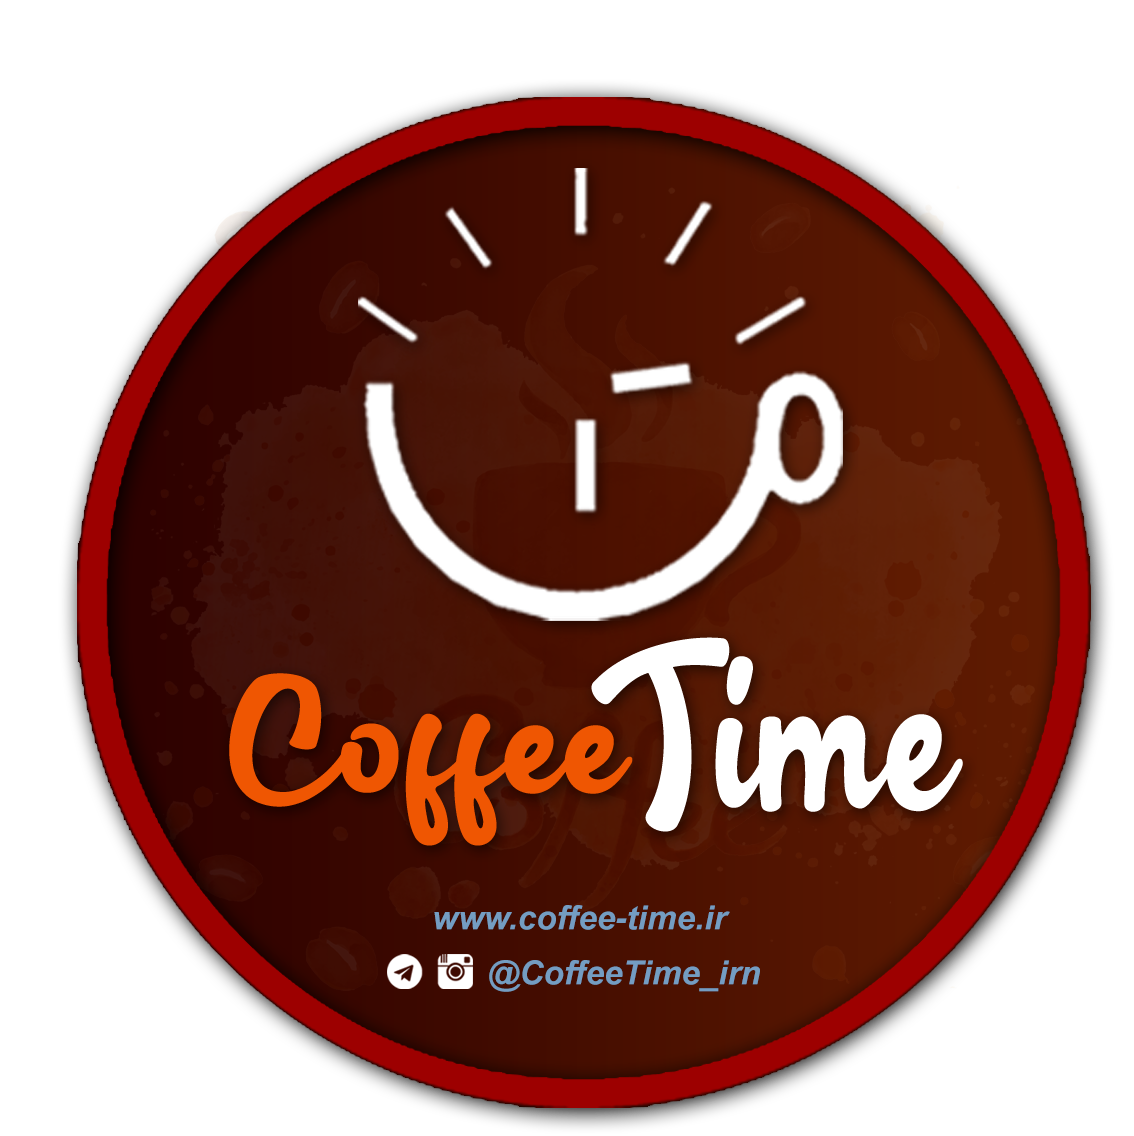 coffeetime_irn